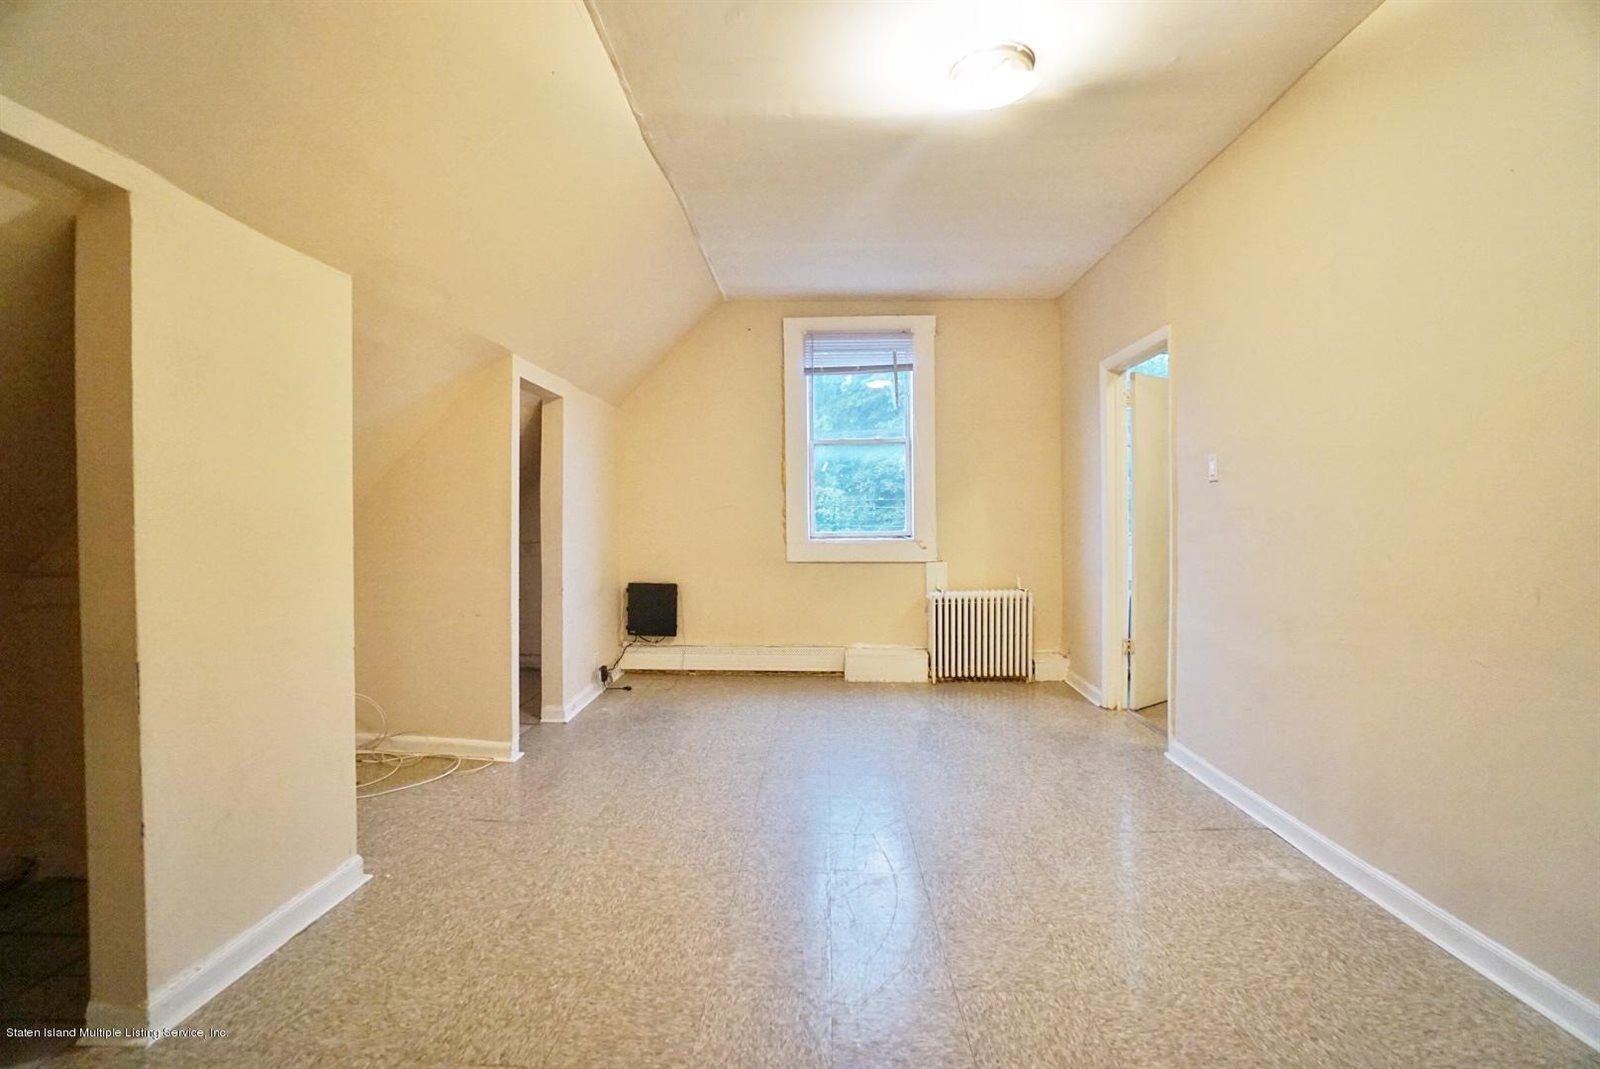 446-448 Jersey Street, Staten Island, NY 10301